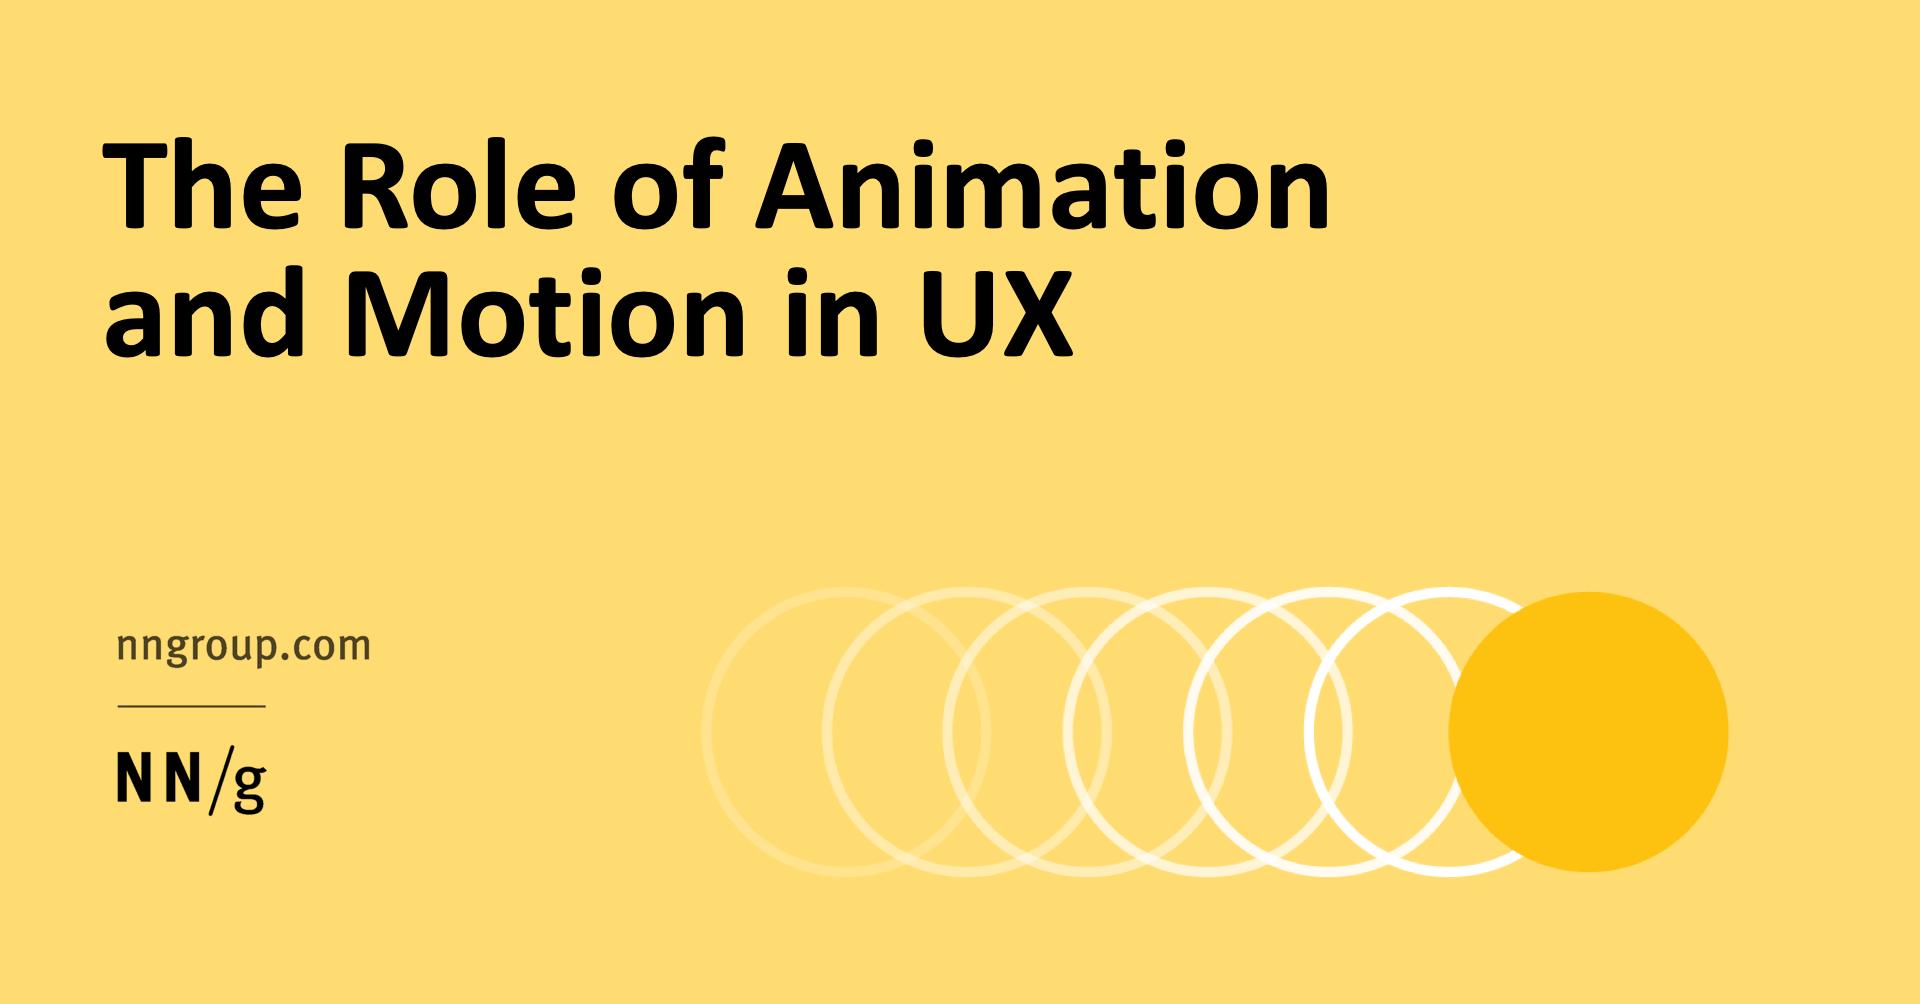 Animation-Motion-UX-Social-Media-Posts_2020